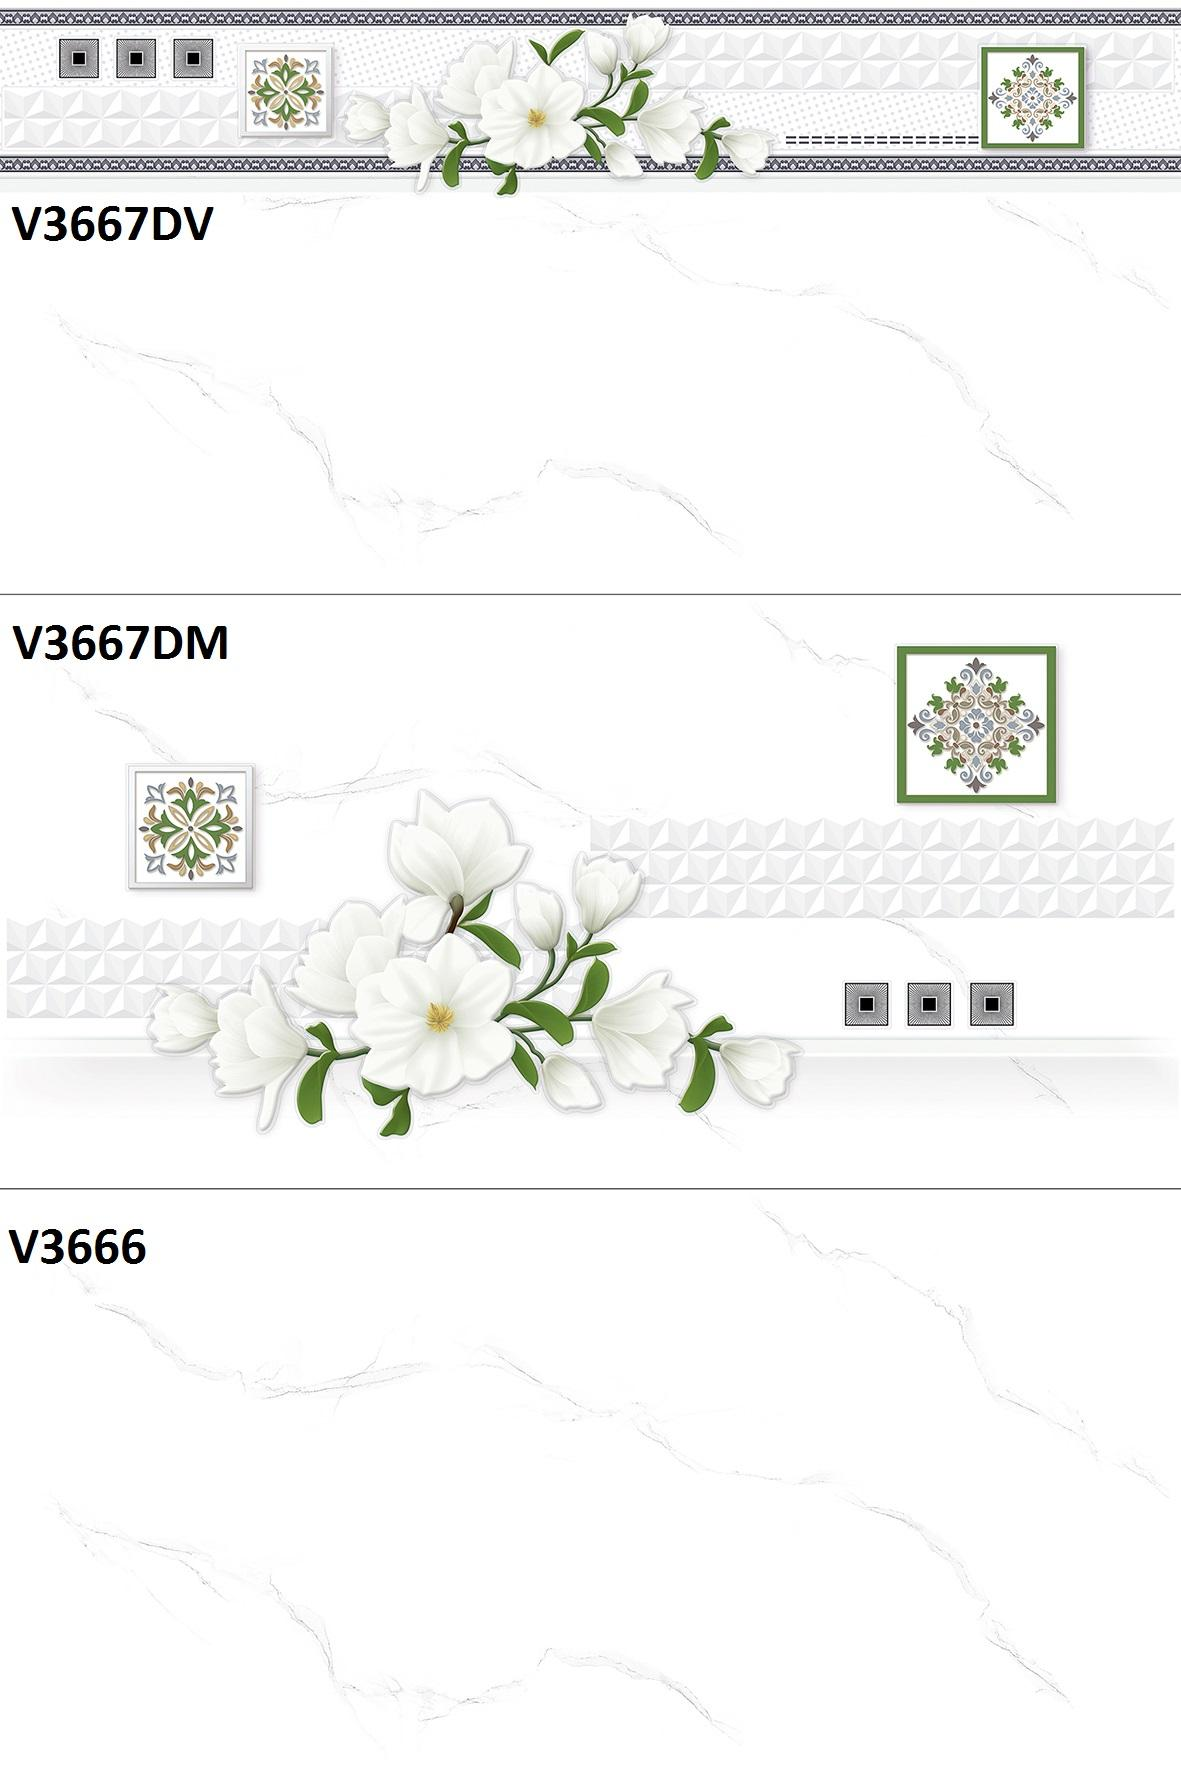 V3667